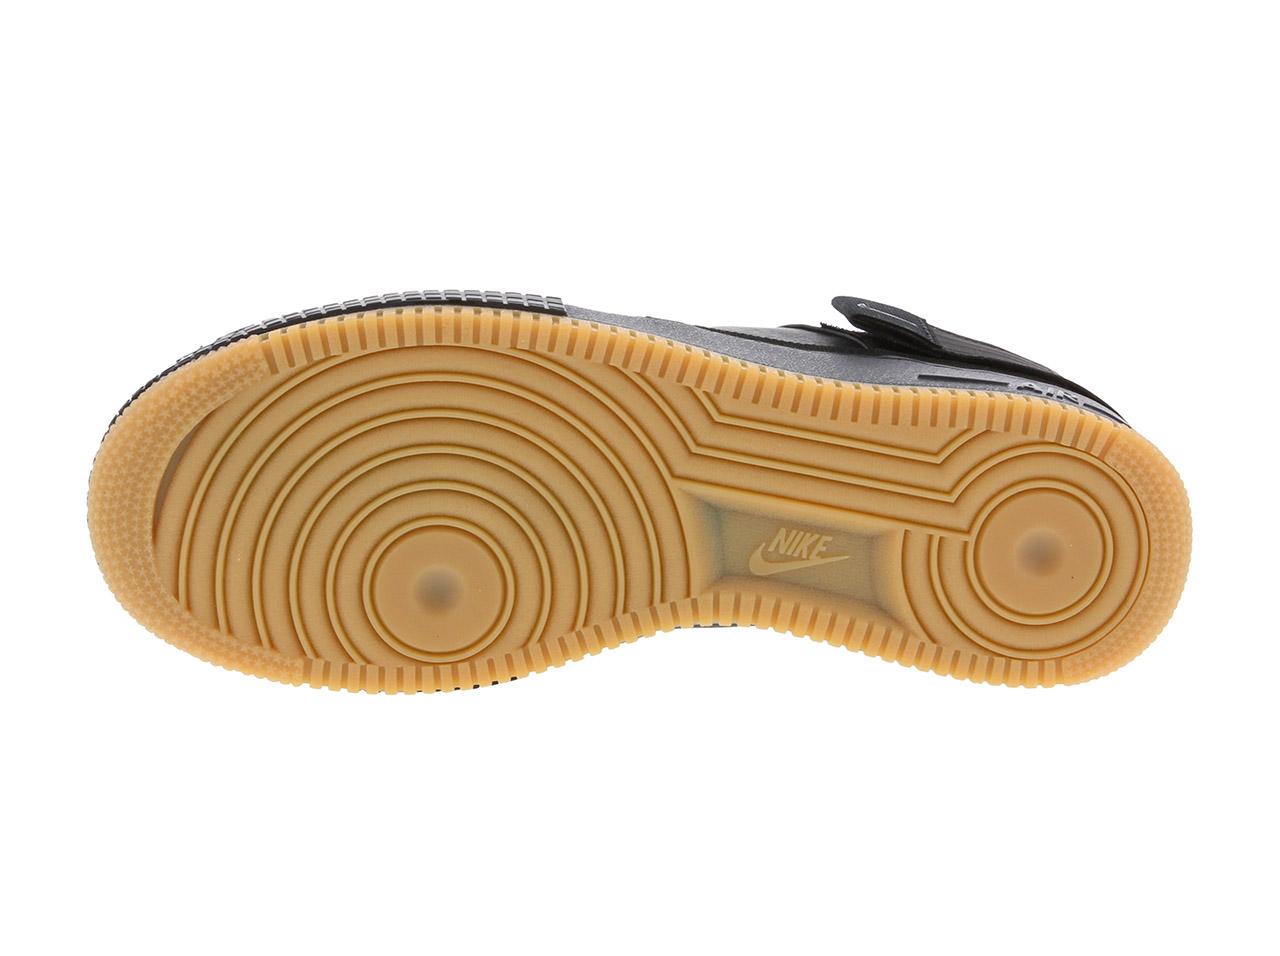 OUTLET特価 NIKE AIR FORCE 1 TYPE 1CJ1281 001ナイキ エアフォースメンズファッションシューズスニーカー靴フットウェアレビューを書いてJMプレゼント対象品sQrhtd